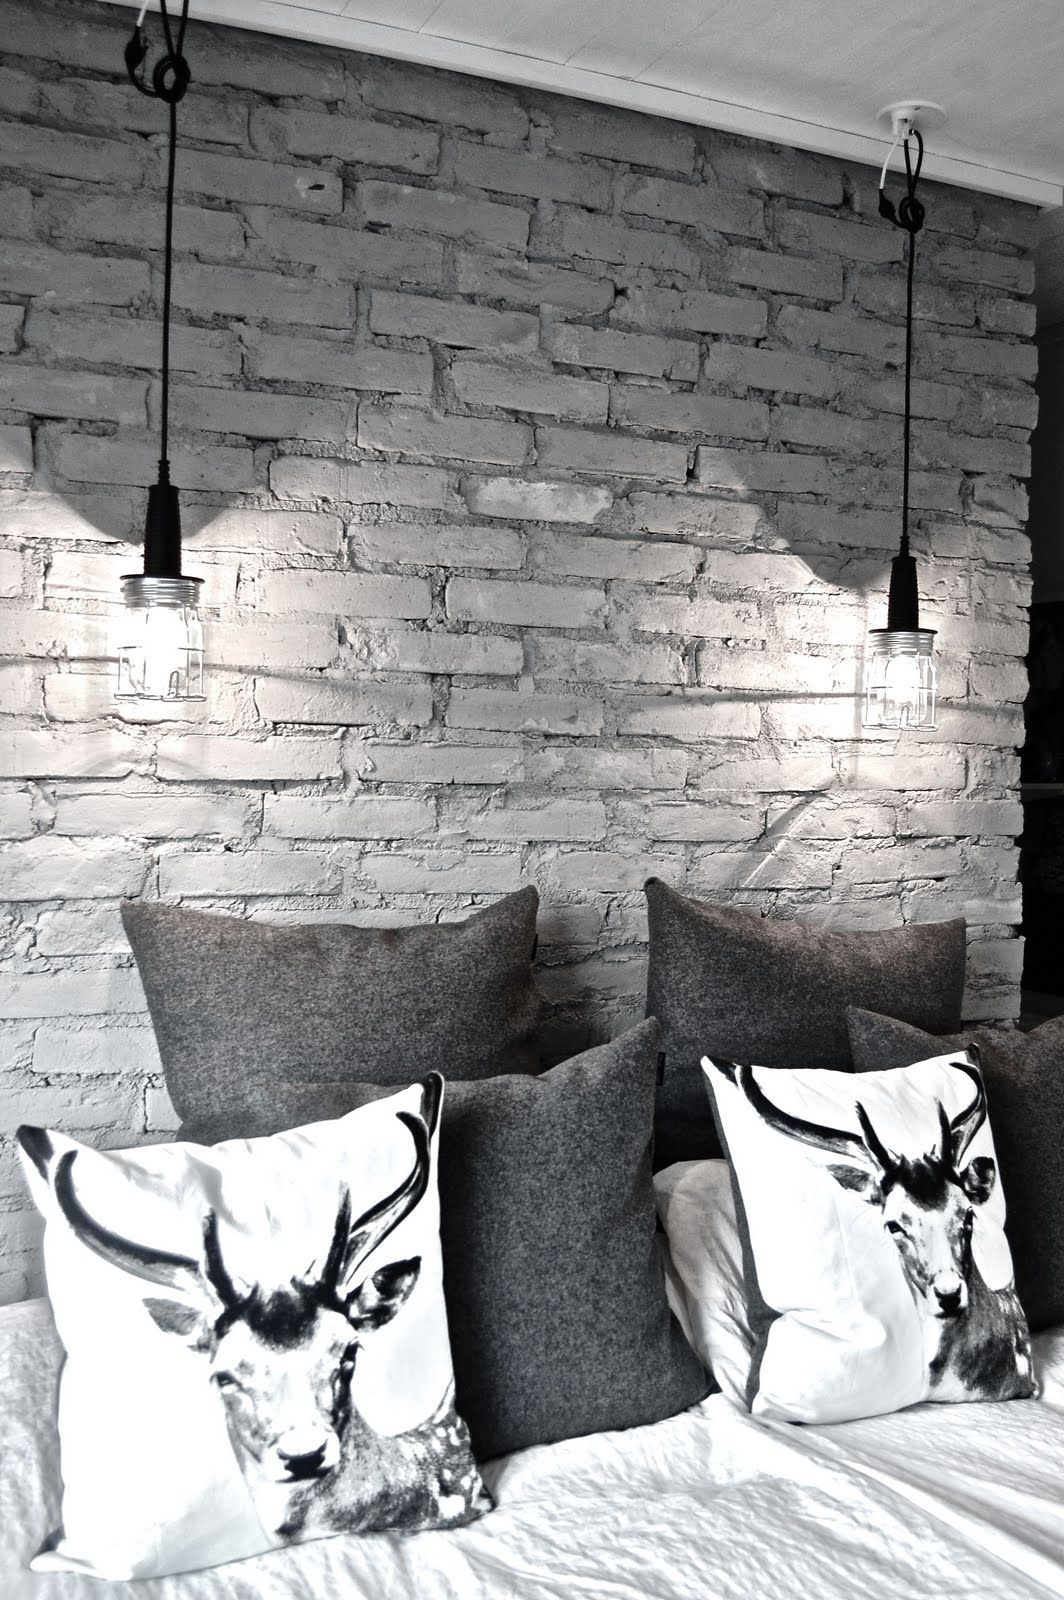 Modern Interior Design Ideas That Brighten Up Brick Walls With White Paint Help To Bring A Light Neut кирпичный интерьер кирпичная стена минималистская спальня